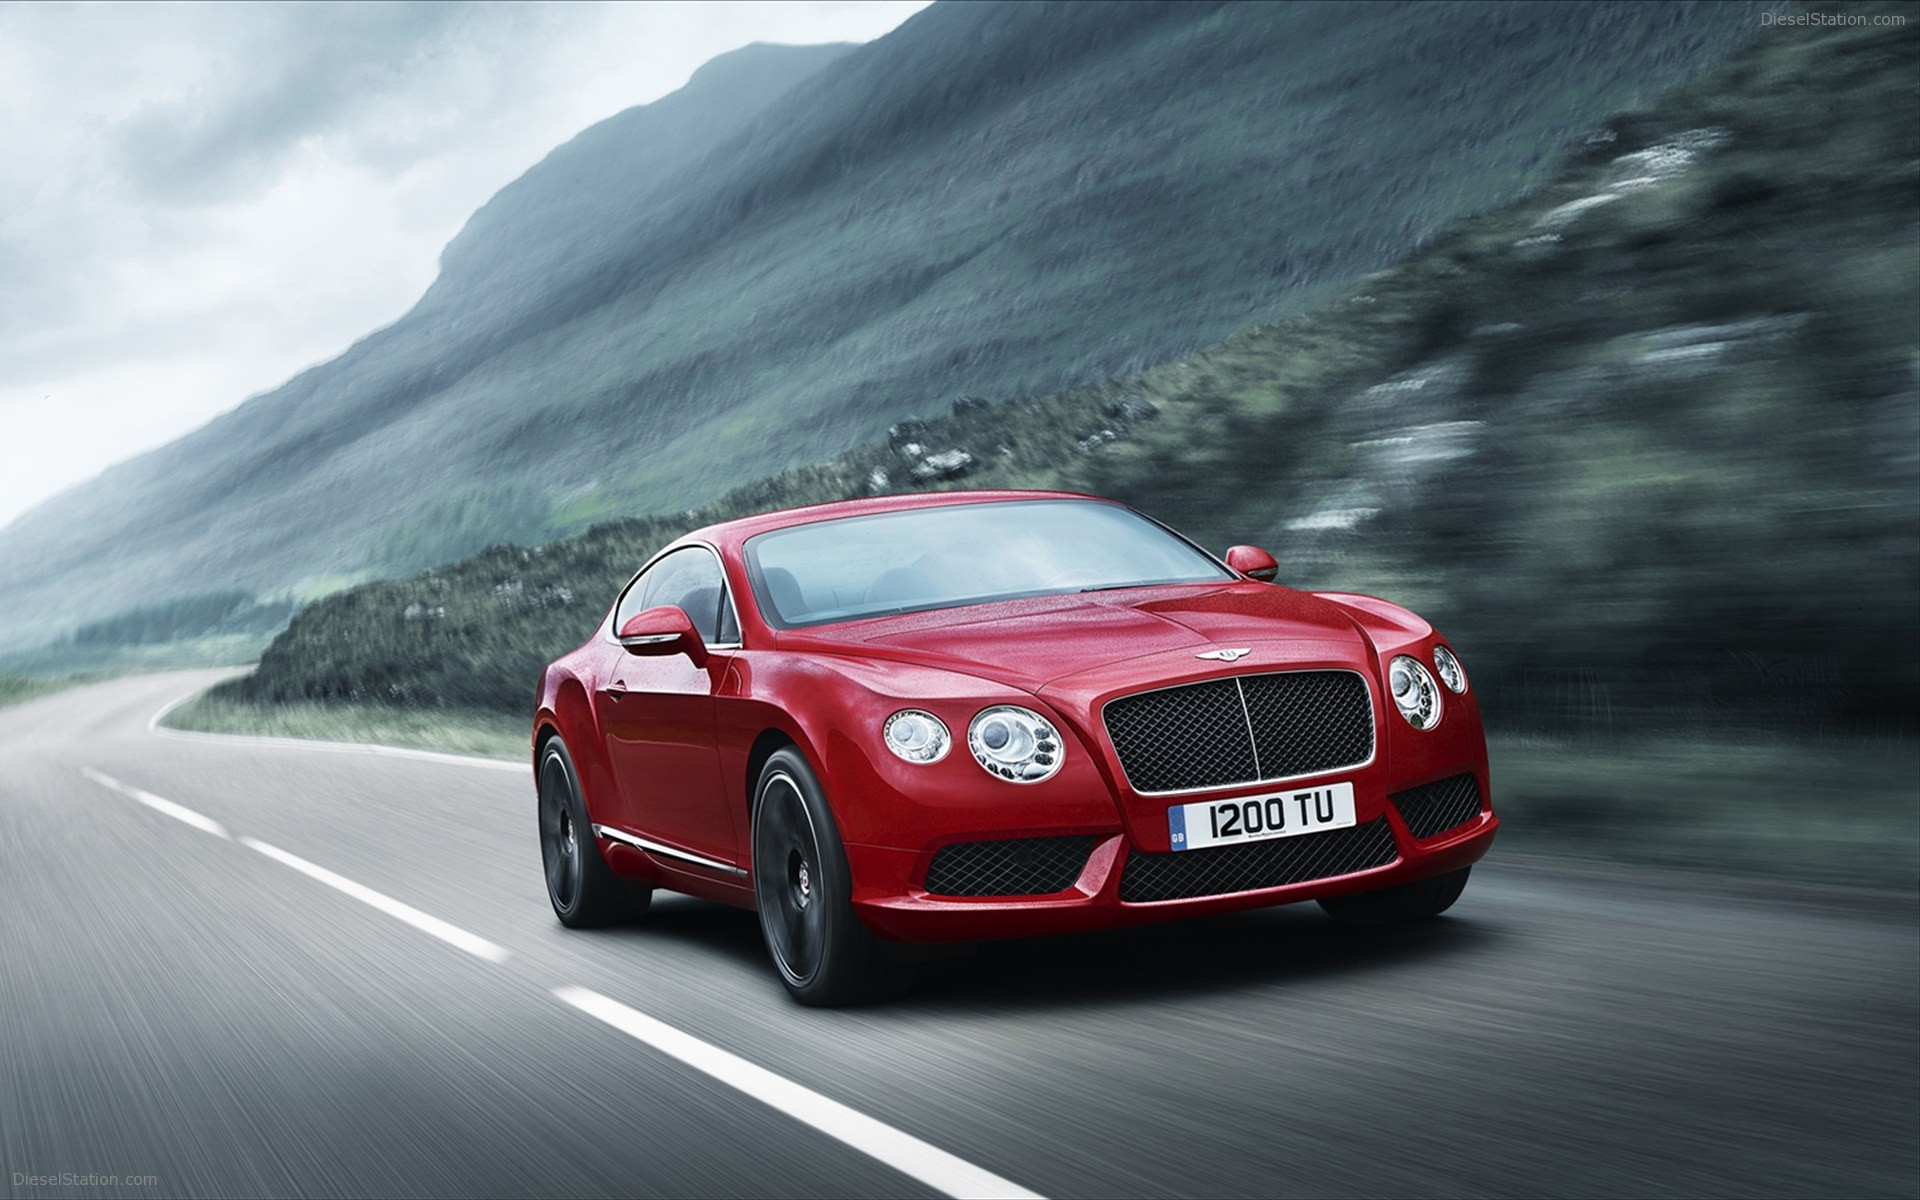 Bentley continental gt wallpaper hd